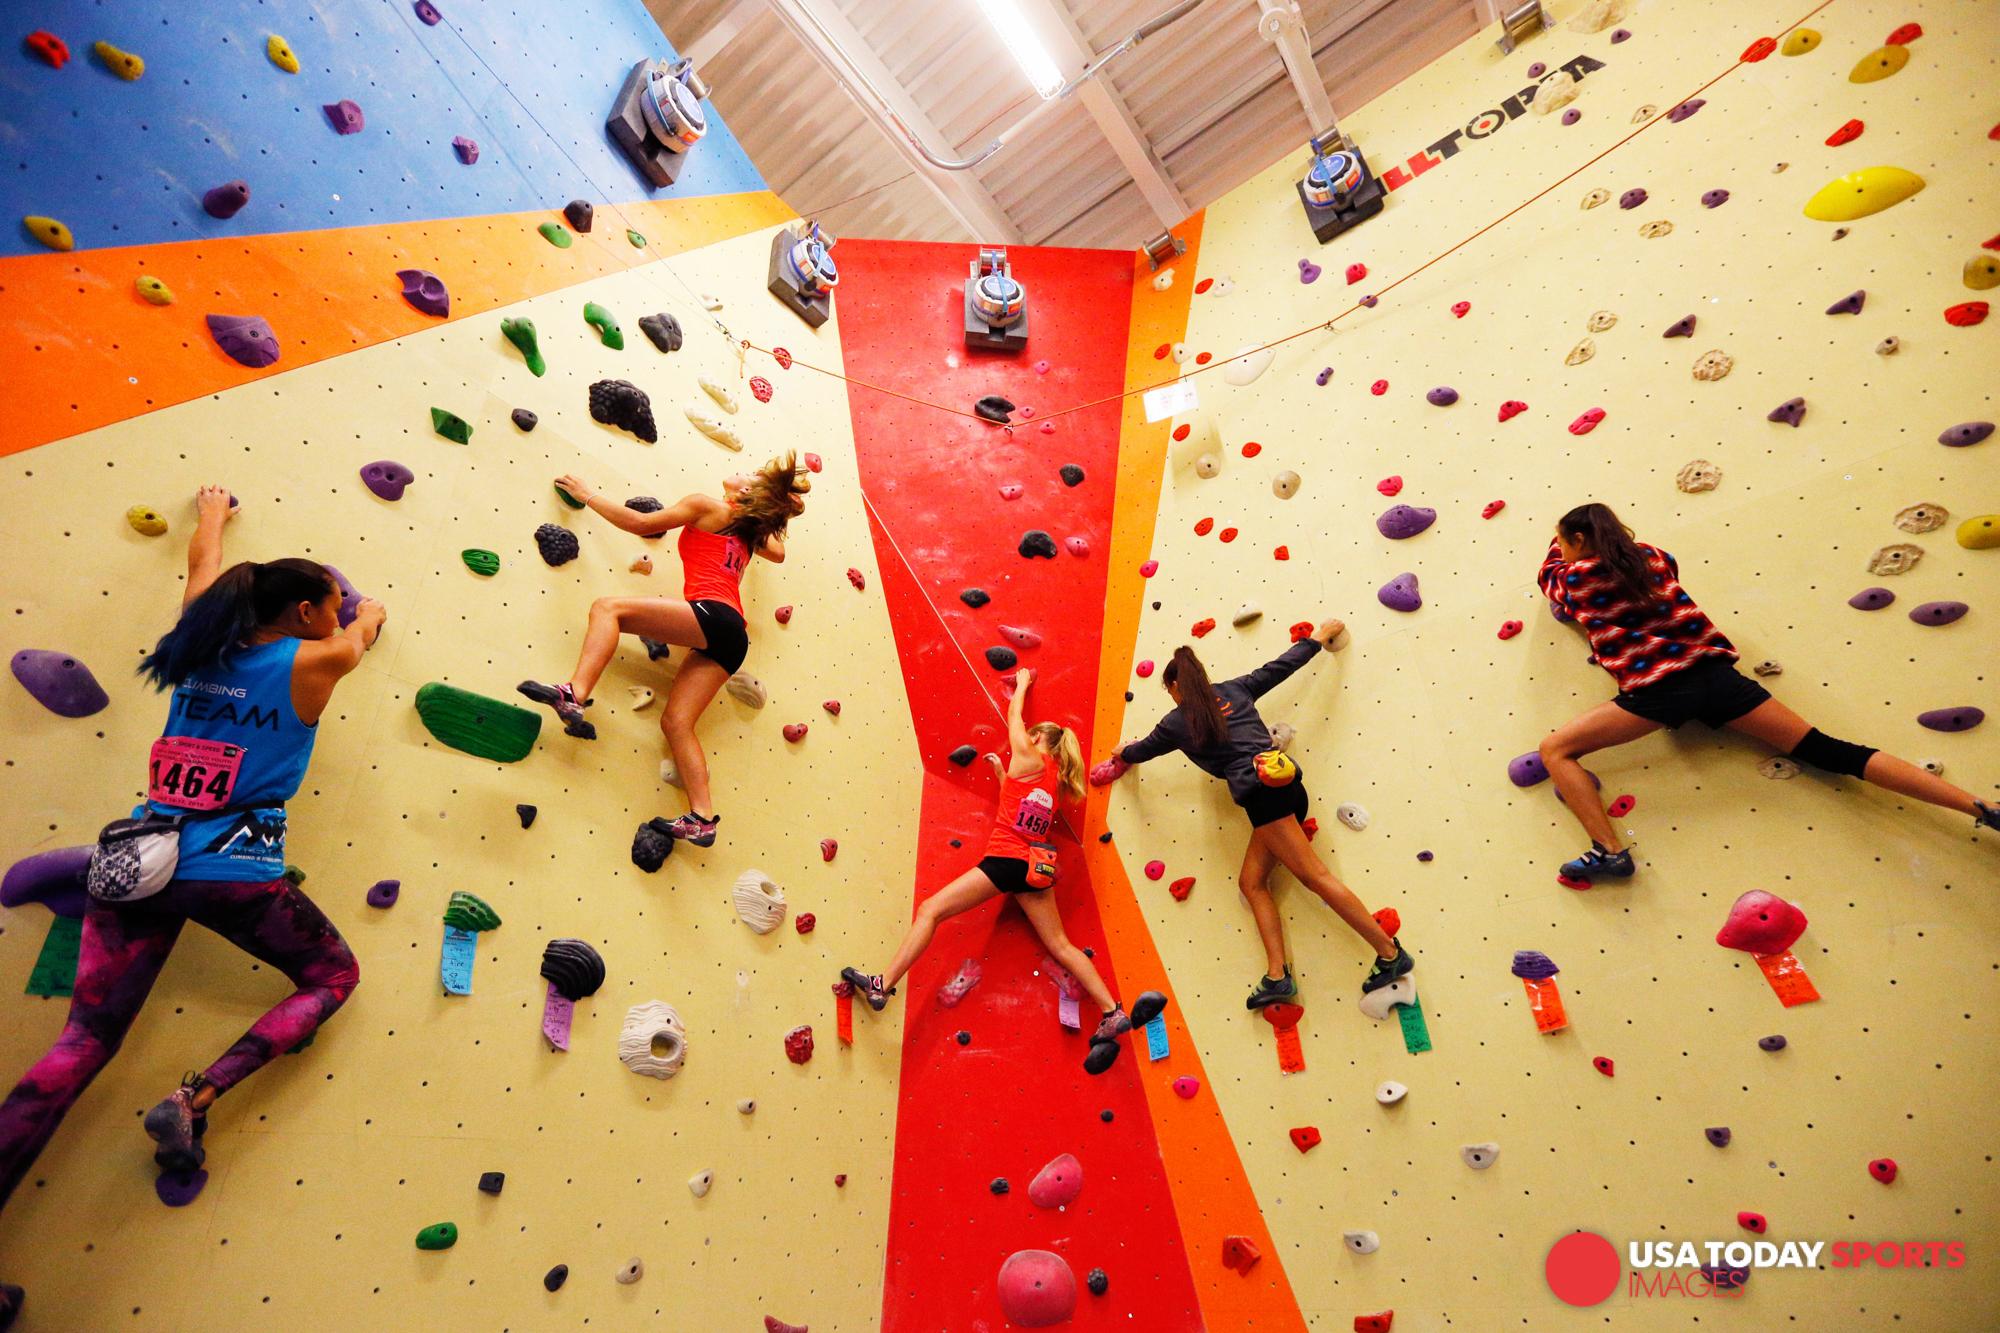 Garrett_Reid_atlanta_advertising_commercial_photographer_sport_and_speed_youth_national_chap_climbing-7.jpg